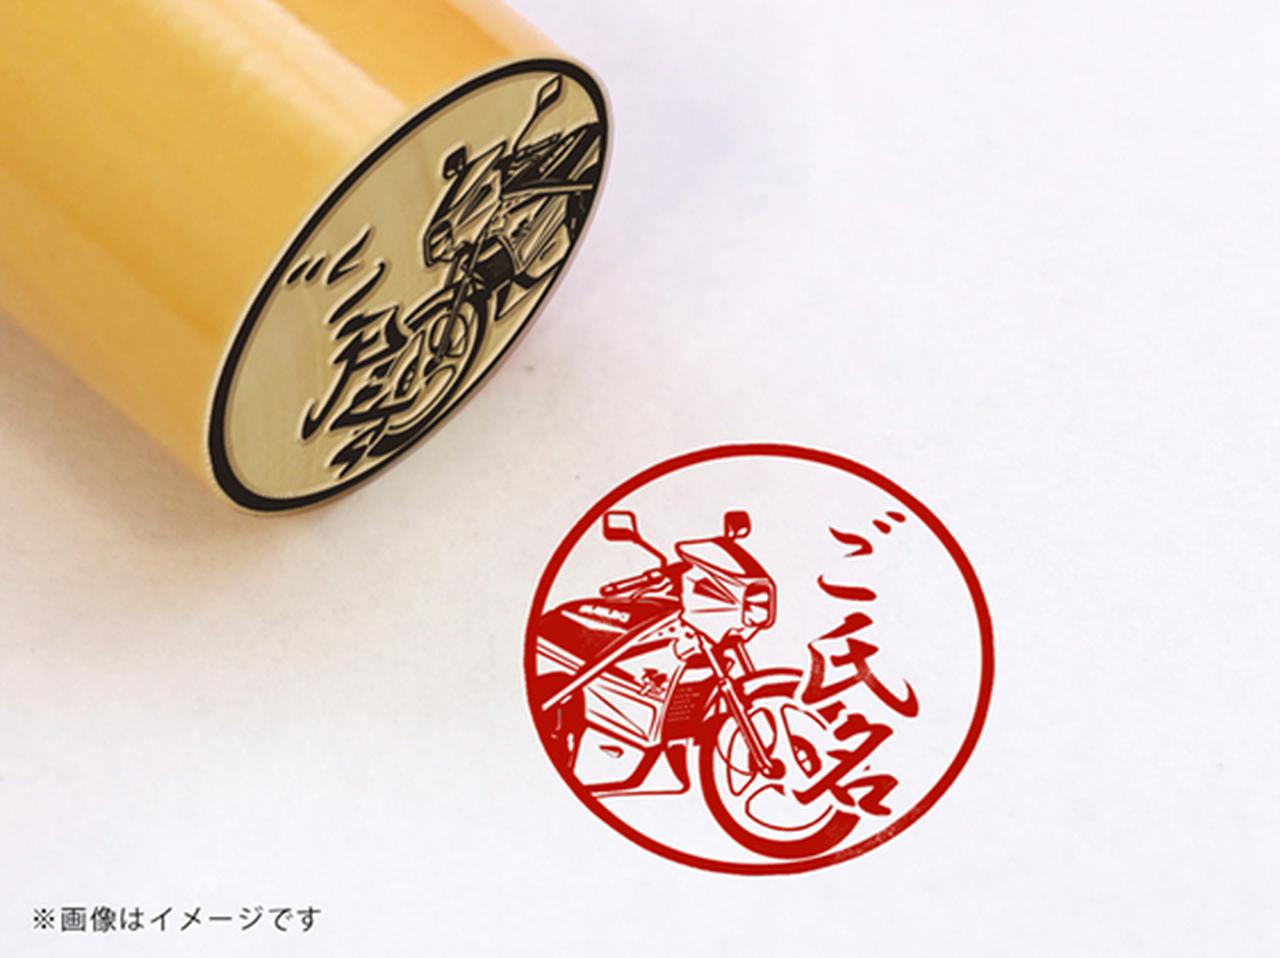 Images : 【SUZUKI】RG50Γ・柘植丸印18mm